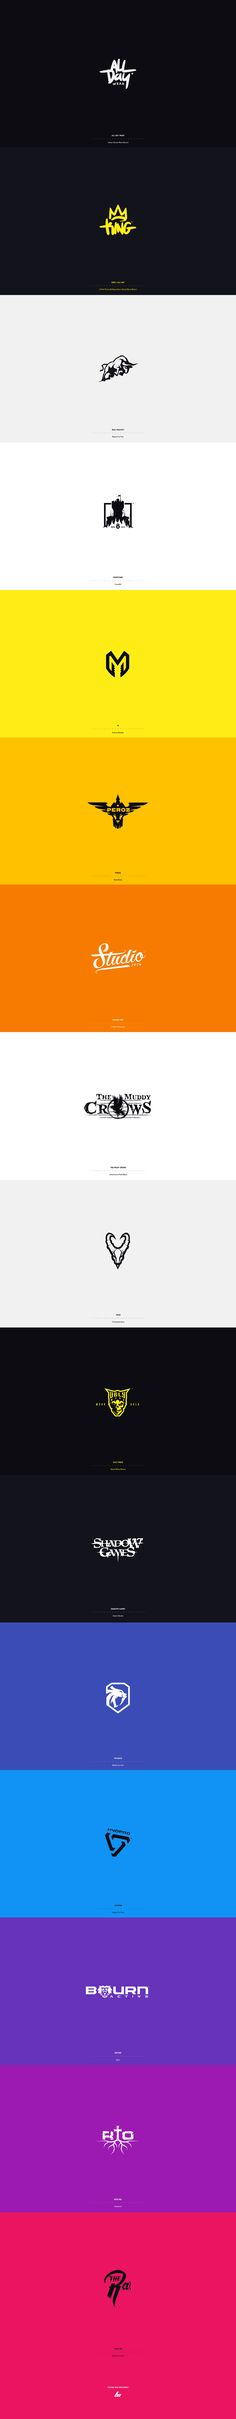 Logo Collection Set 02 on Behance